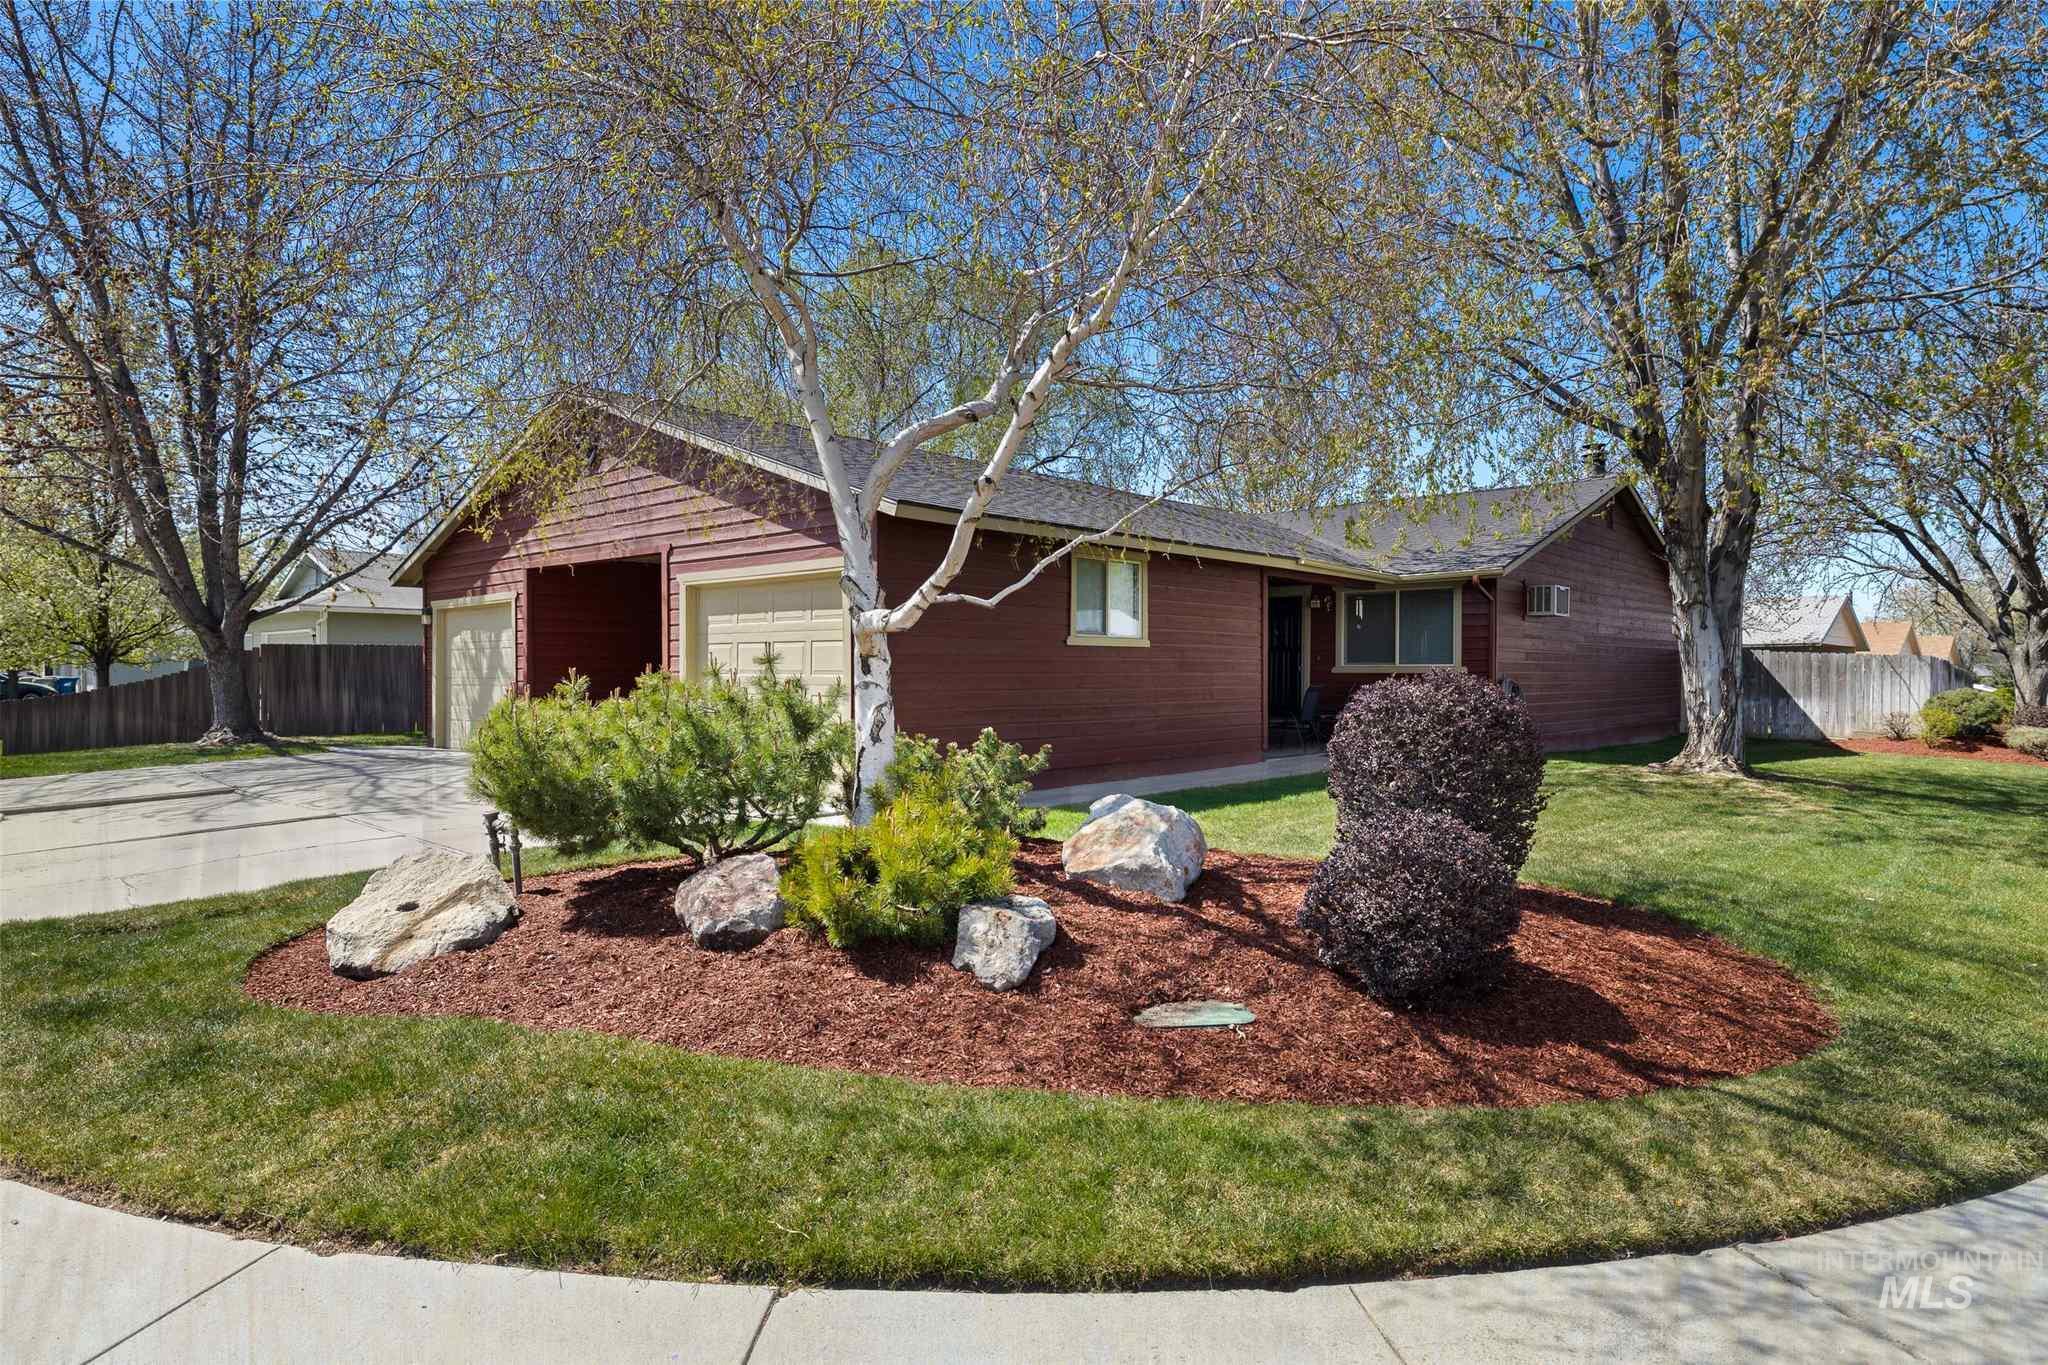 903 S Wild Phlox Way Property Photo - Boise, ID real estate listing